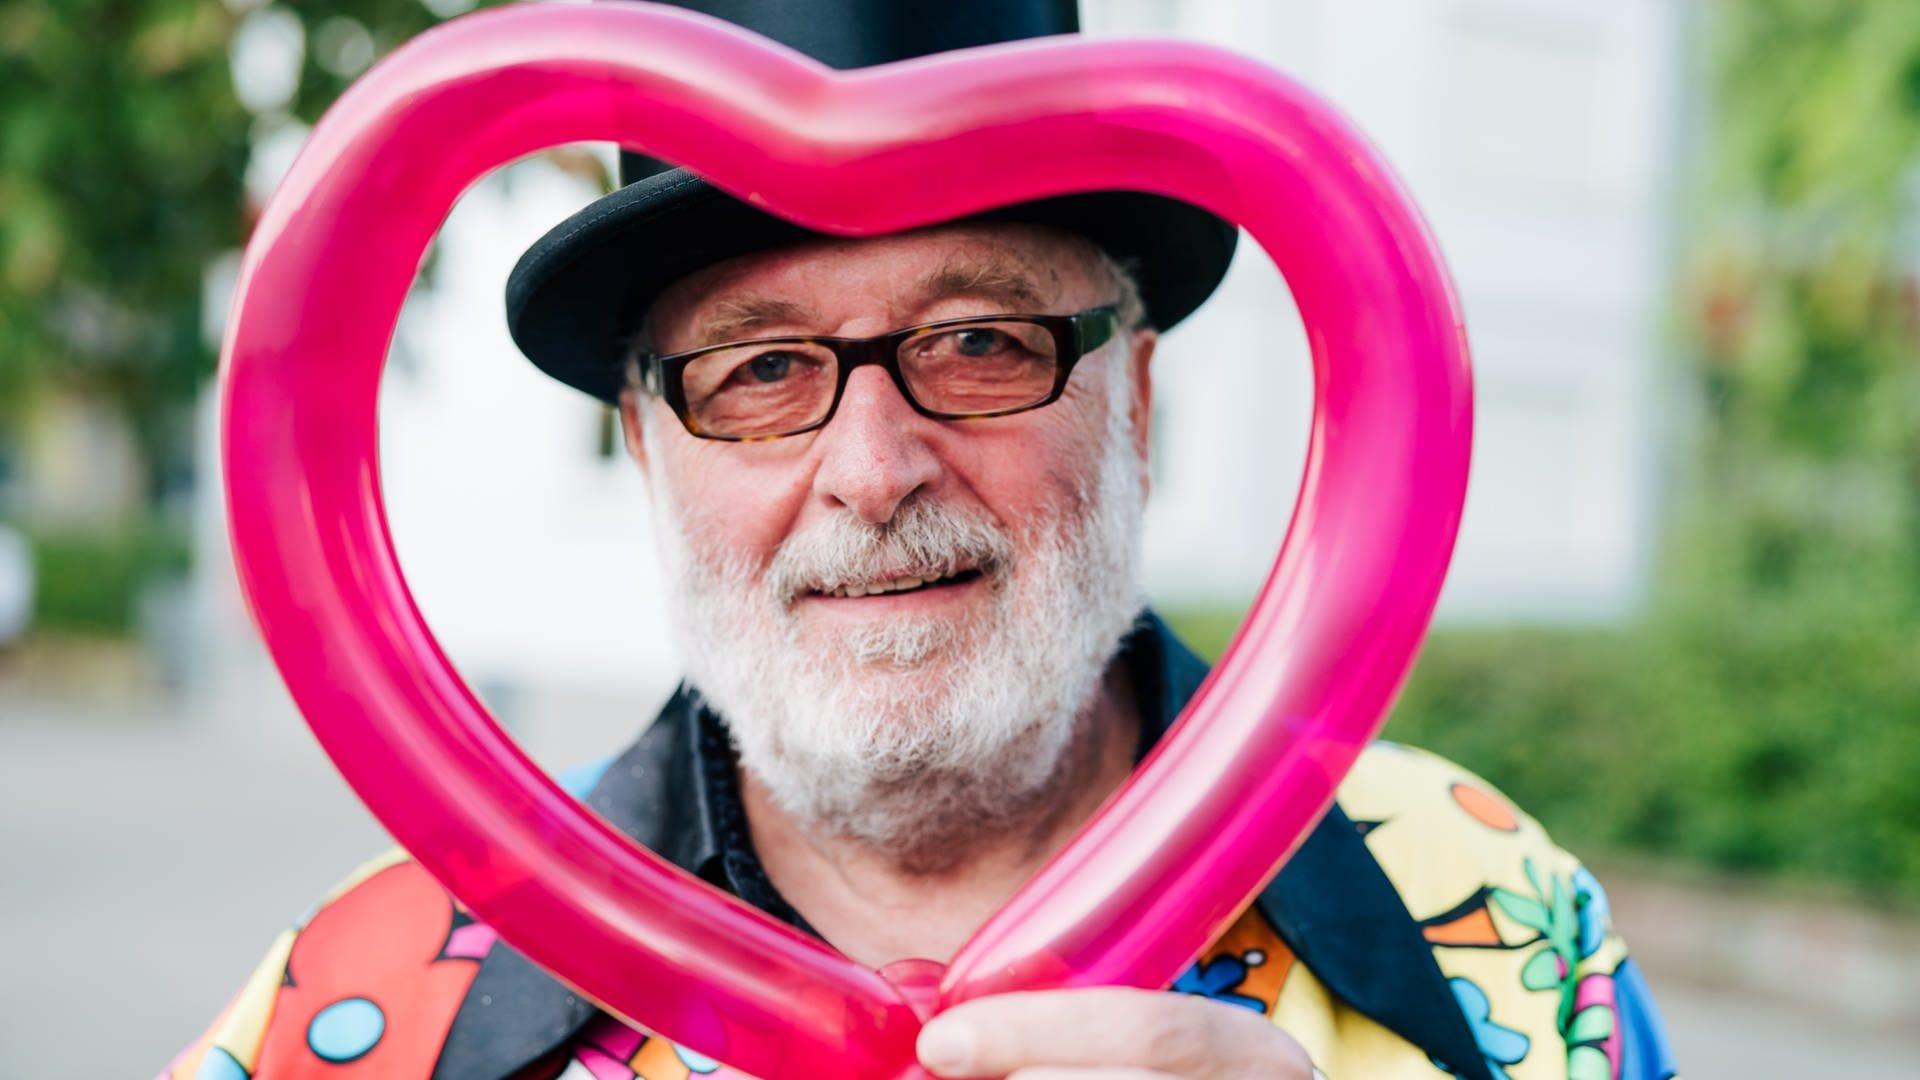 Ballonkünstler in Heilbronn